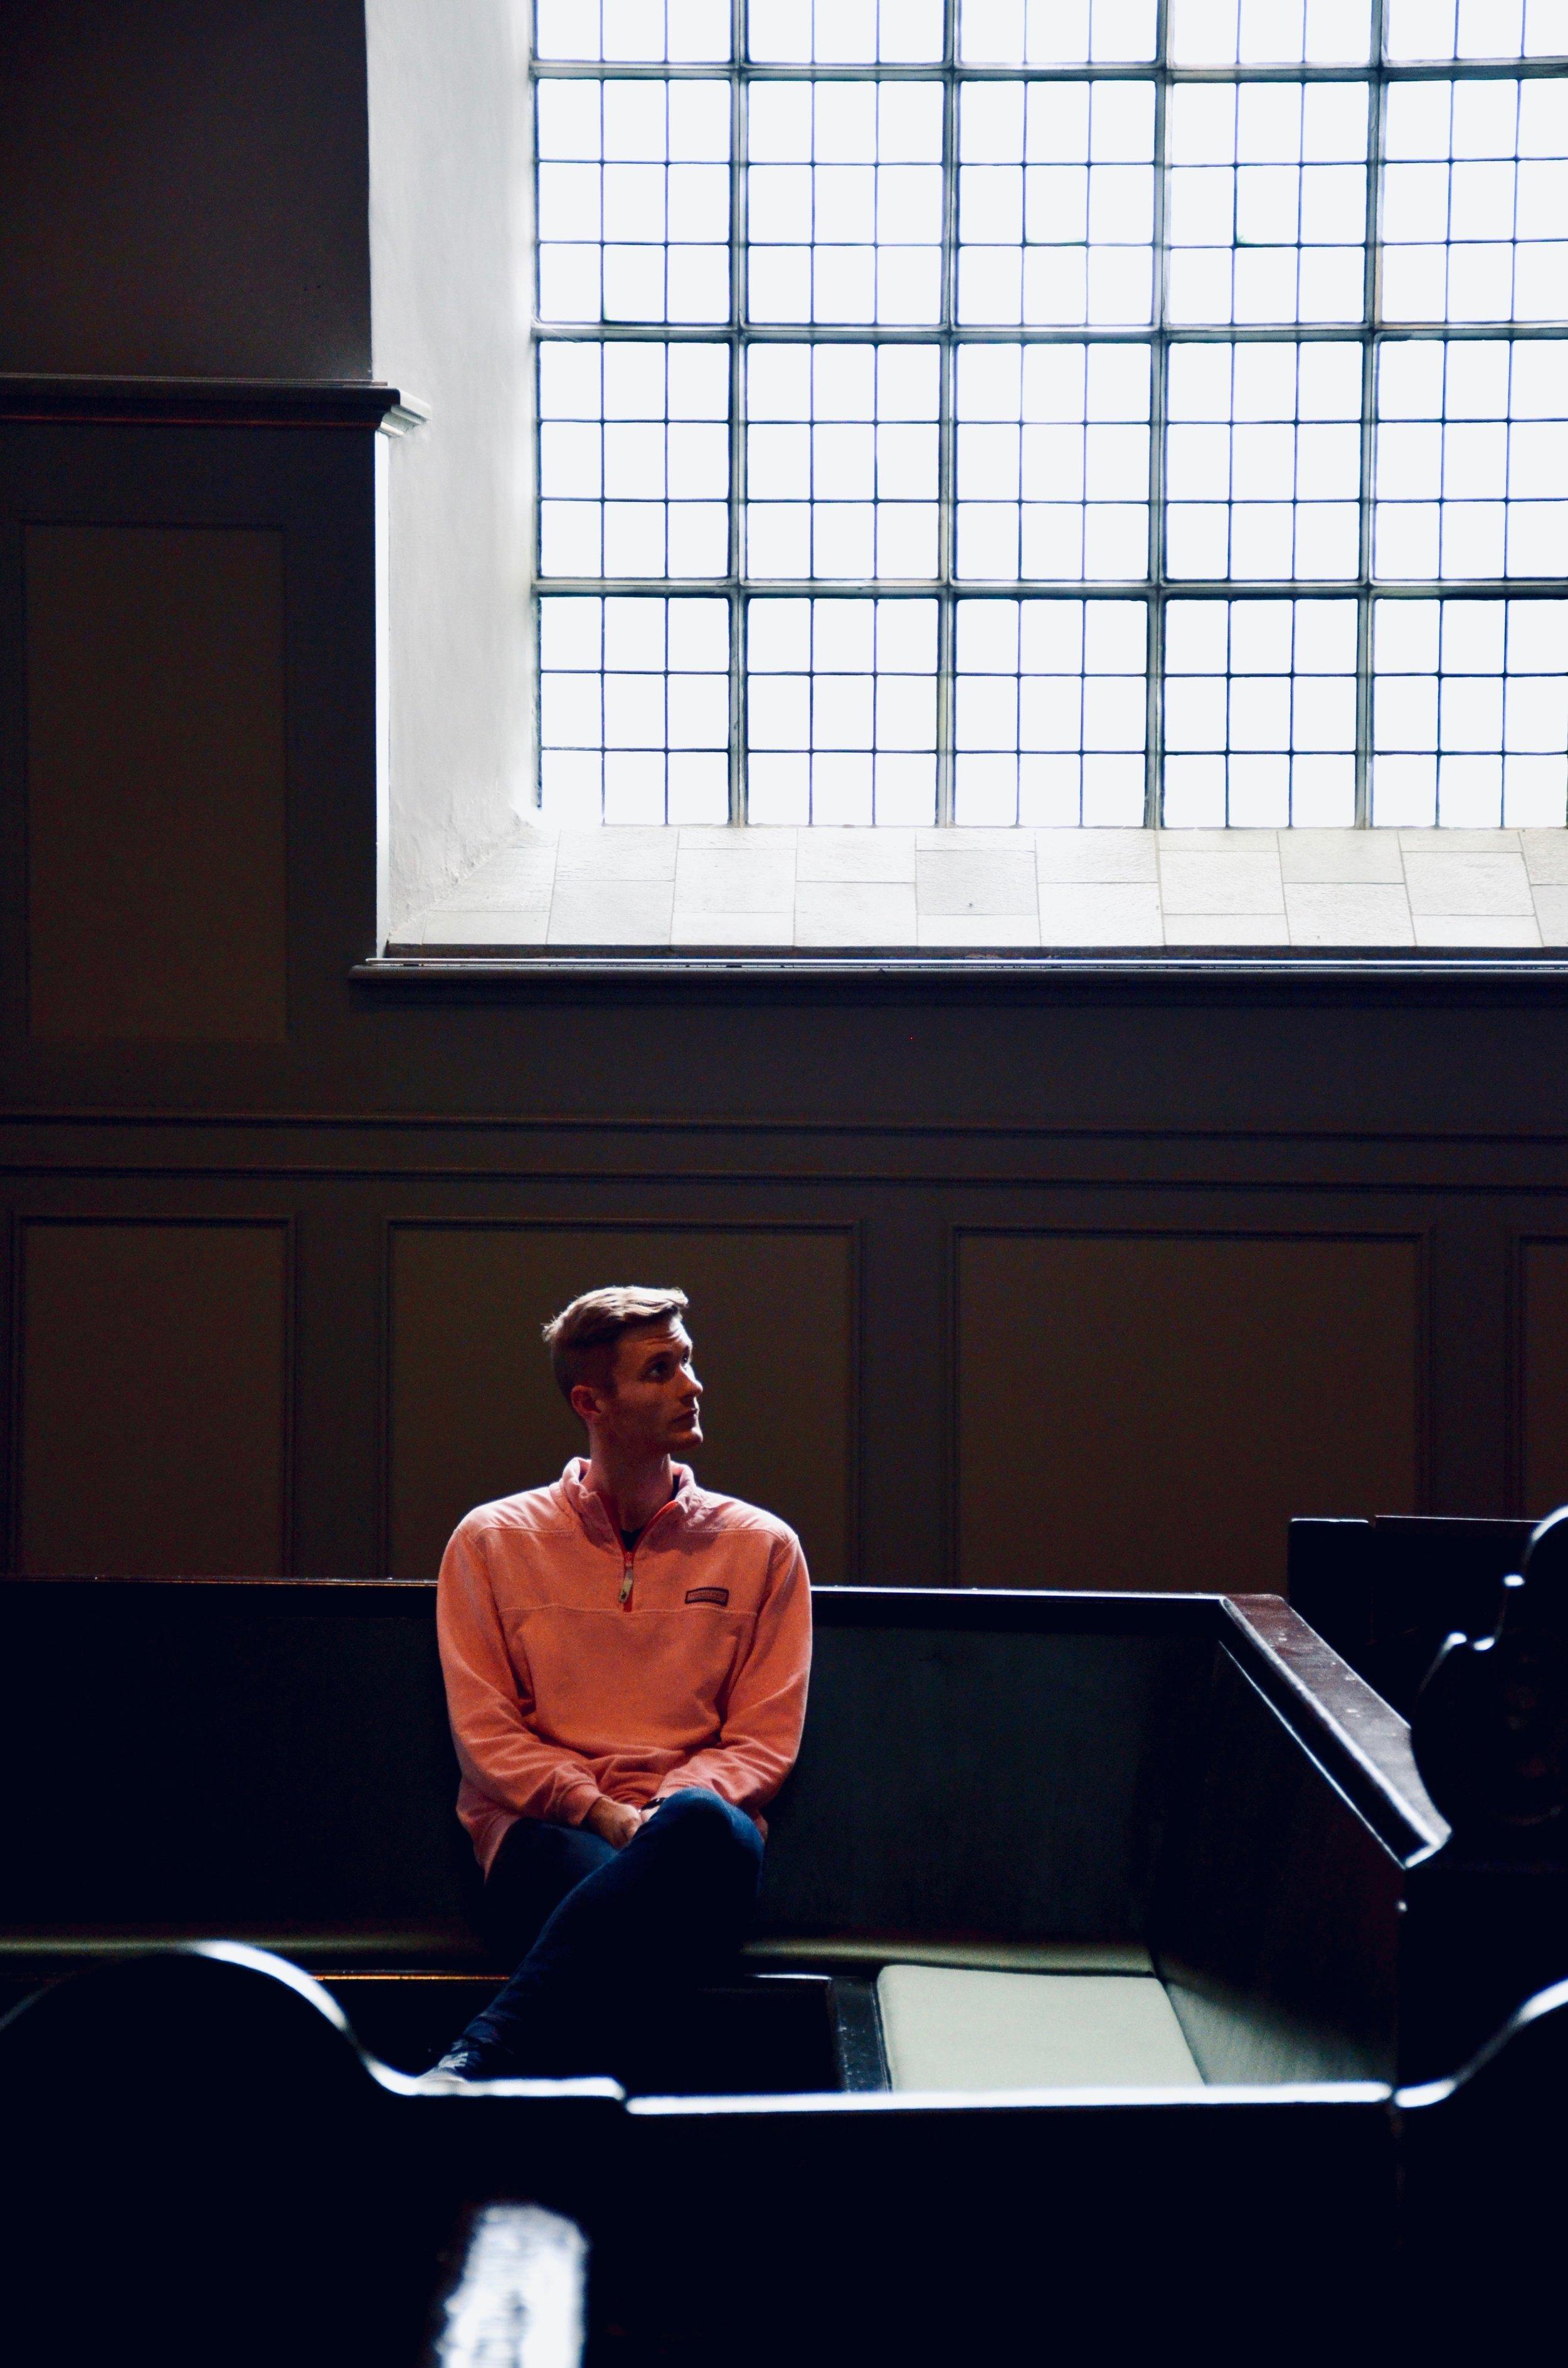 Evan Currie listens to the 1688 Schnitger Organ, St. Pankratius, Neuenfelde, Germany. Boston Organ Studio.